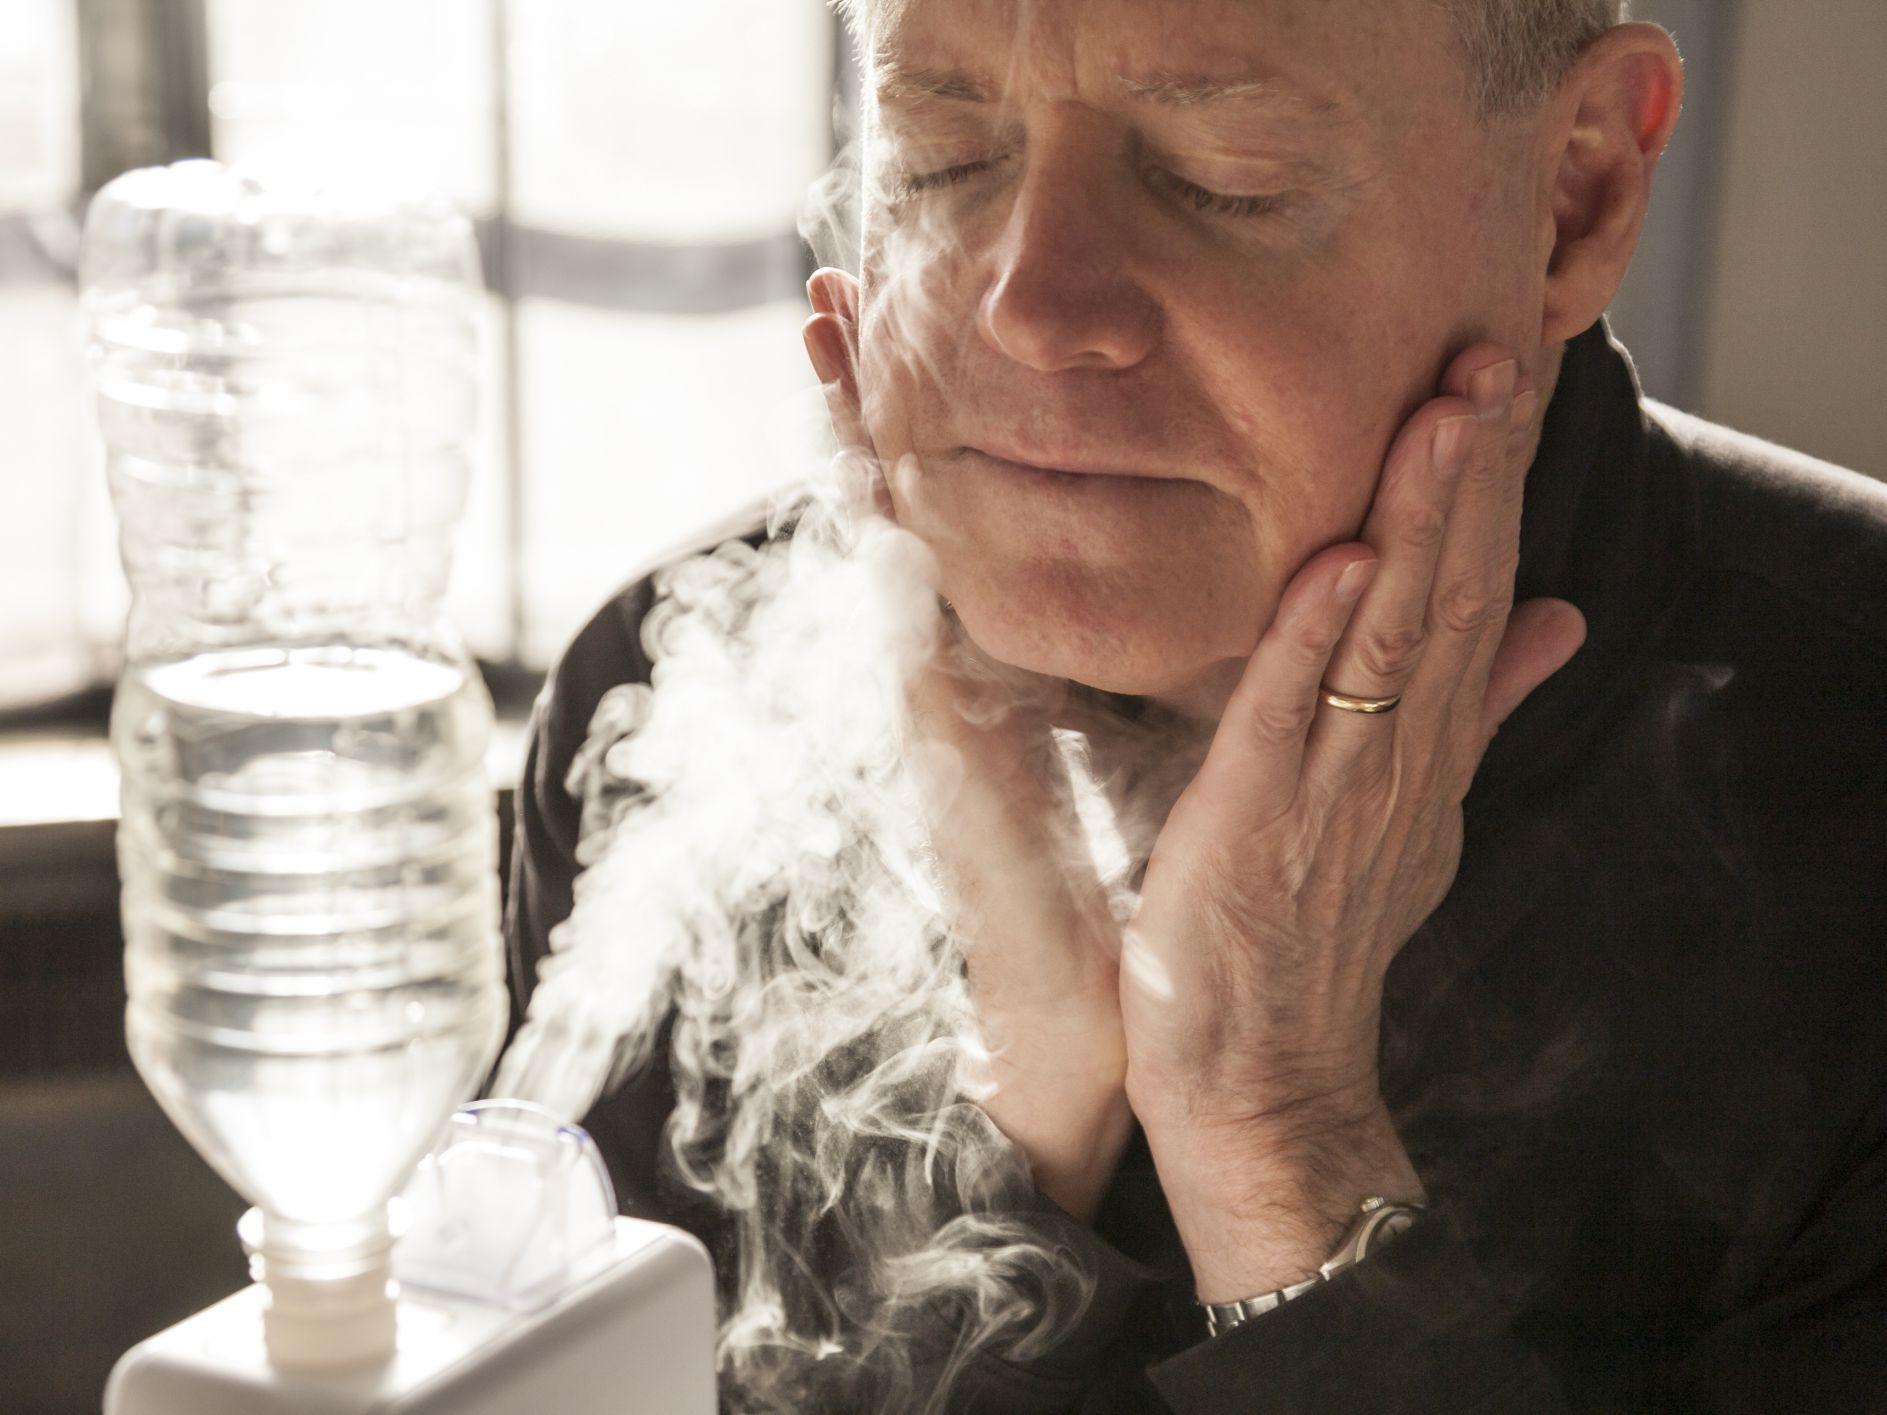 Natural Home Remedies for Post-Nasal Drip